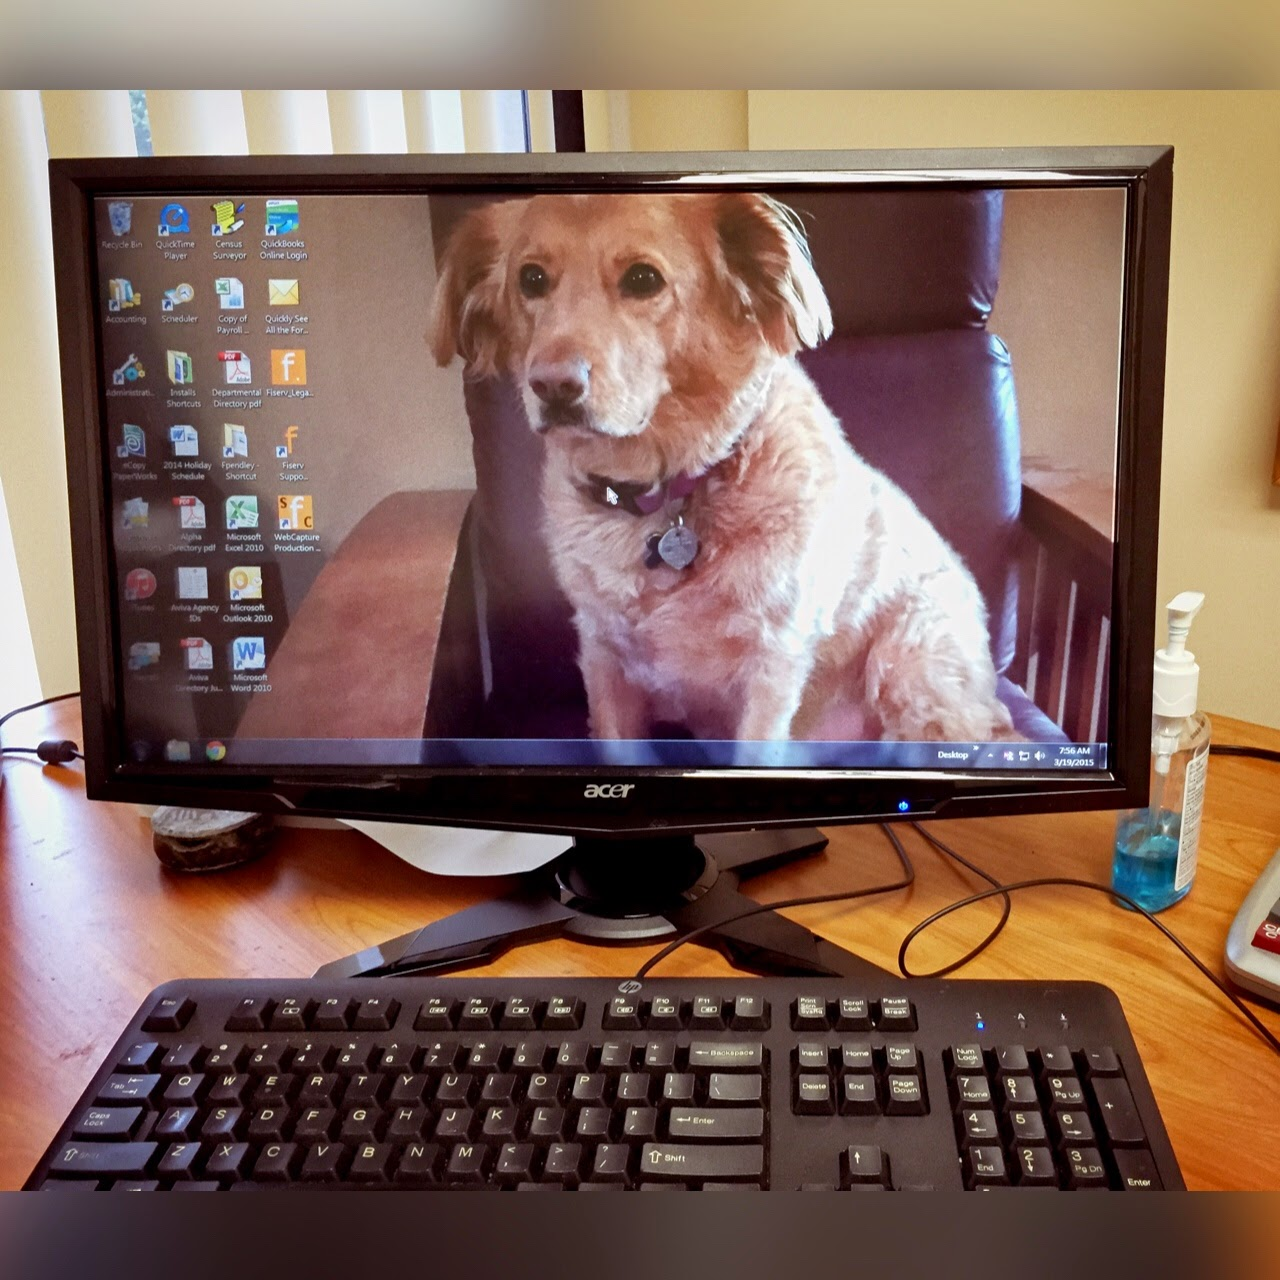 the desktop on my desk at my office